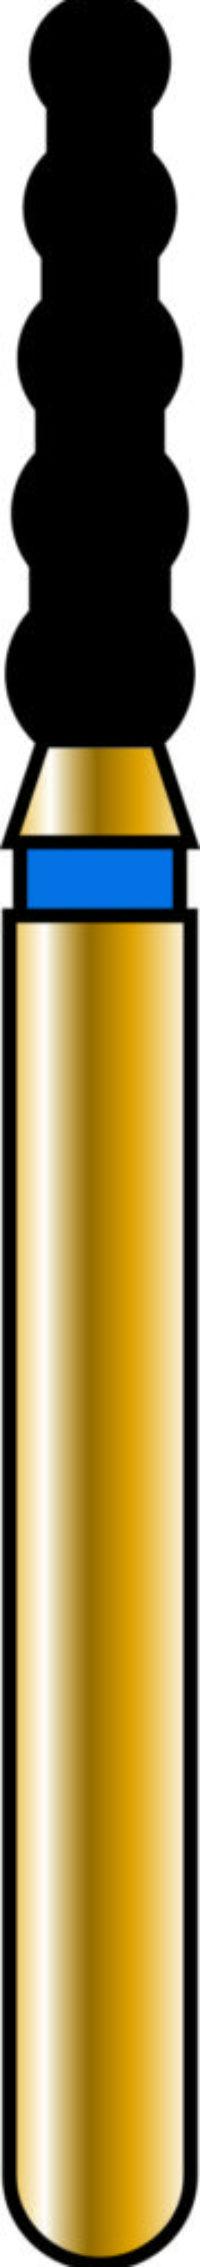 Cylinder 18-6mm Gold Diamond Bur - Super Coarse Grit